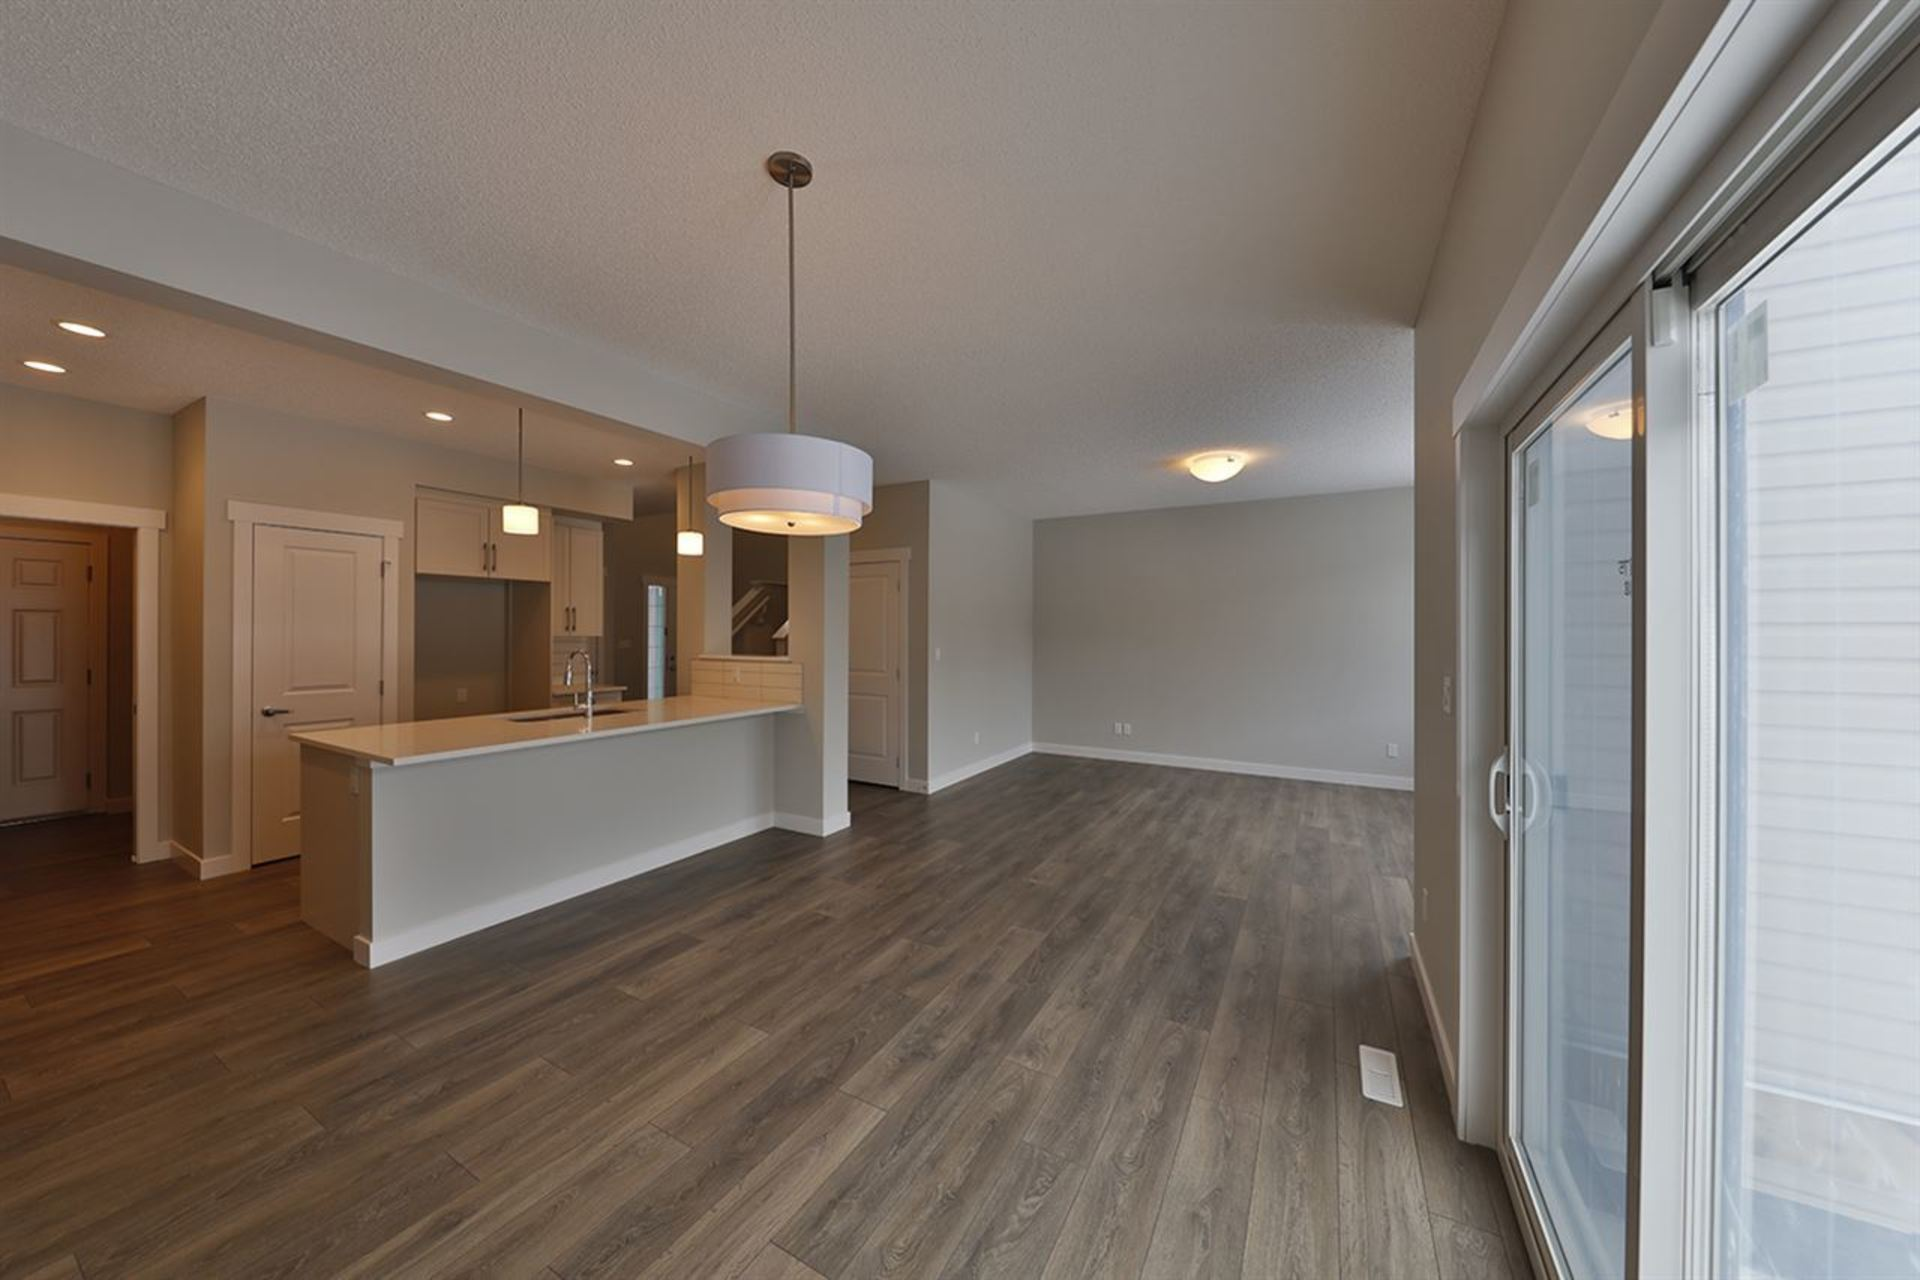 17550-60a-street-mcconachie-area-edmonton-08 at 17550 60a Street, McConachie Area, Edmonton